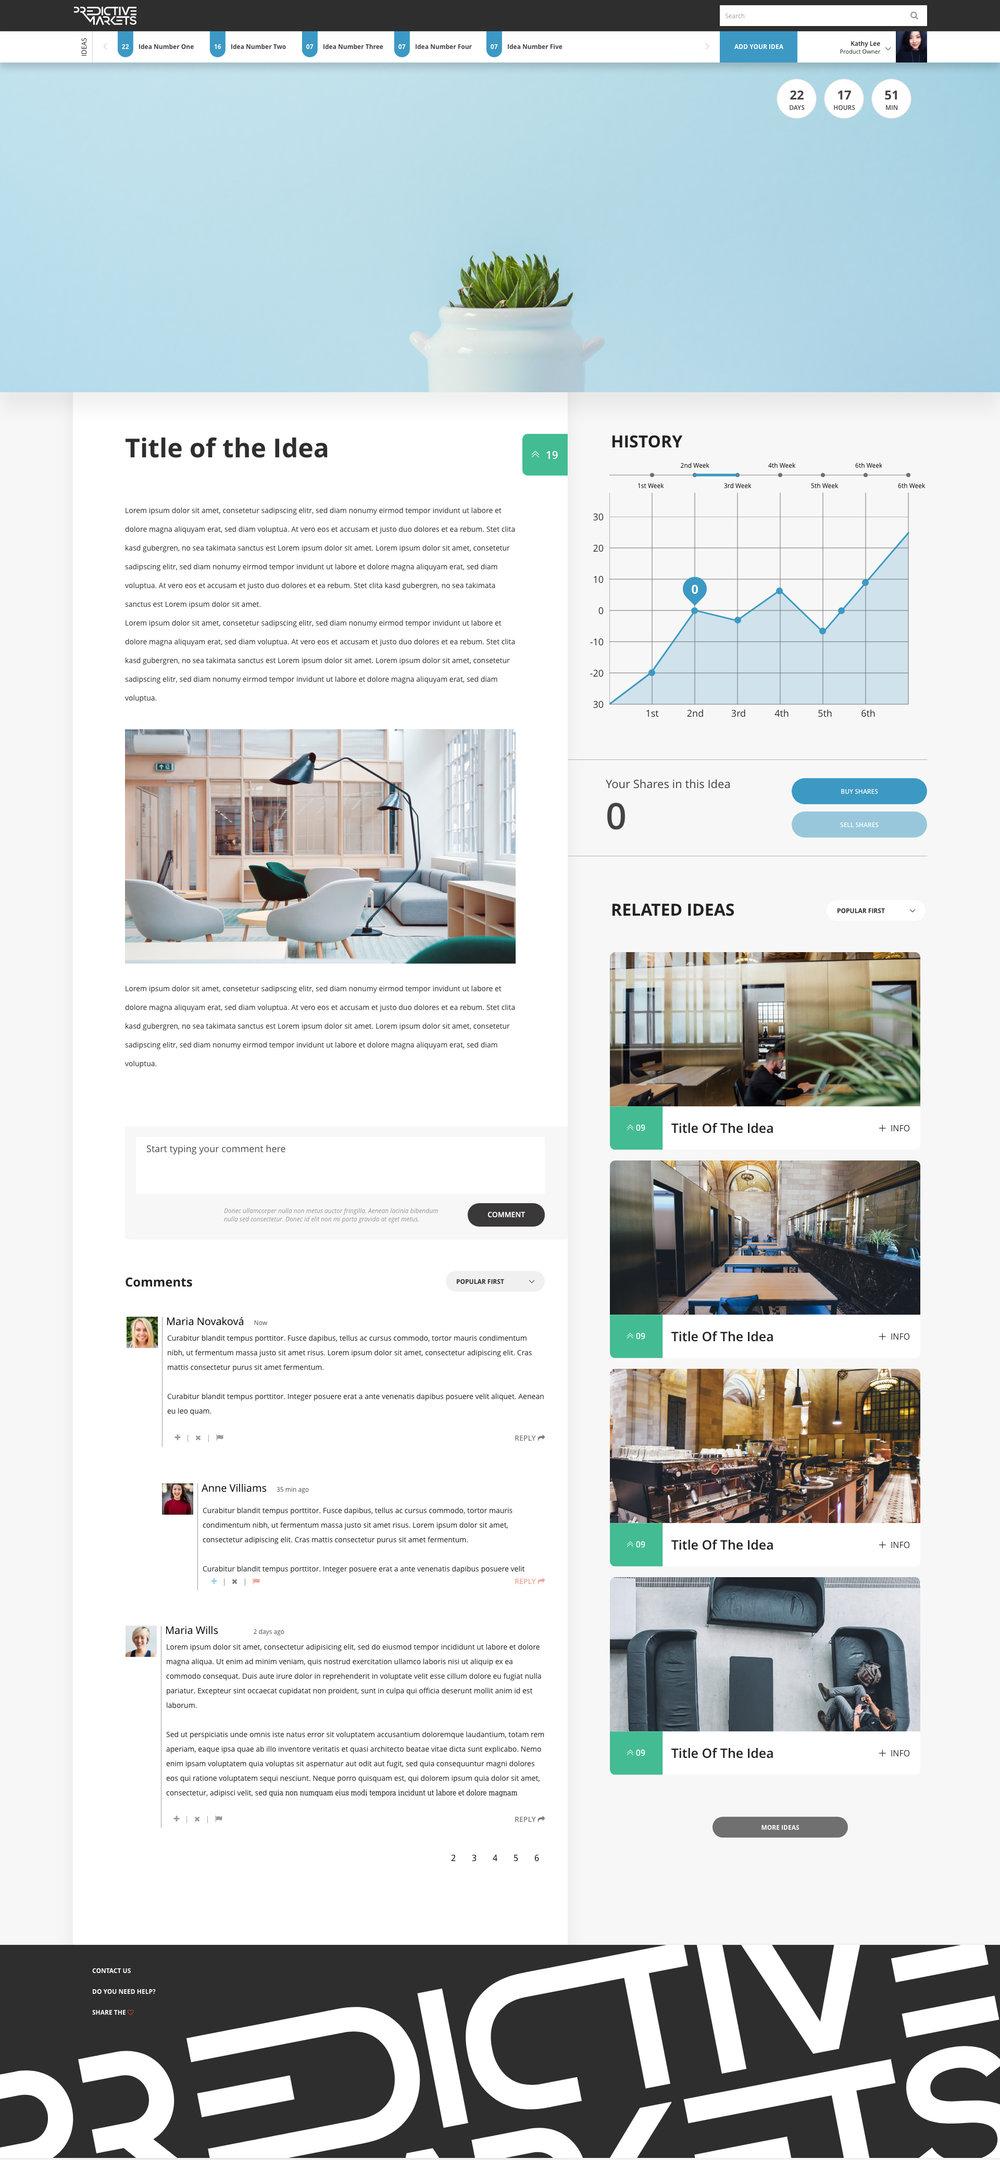 Desktop - IDEAS DETAIL 2@2x.jpg